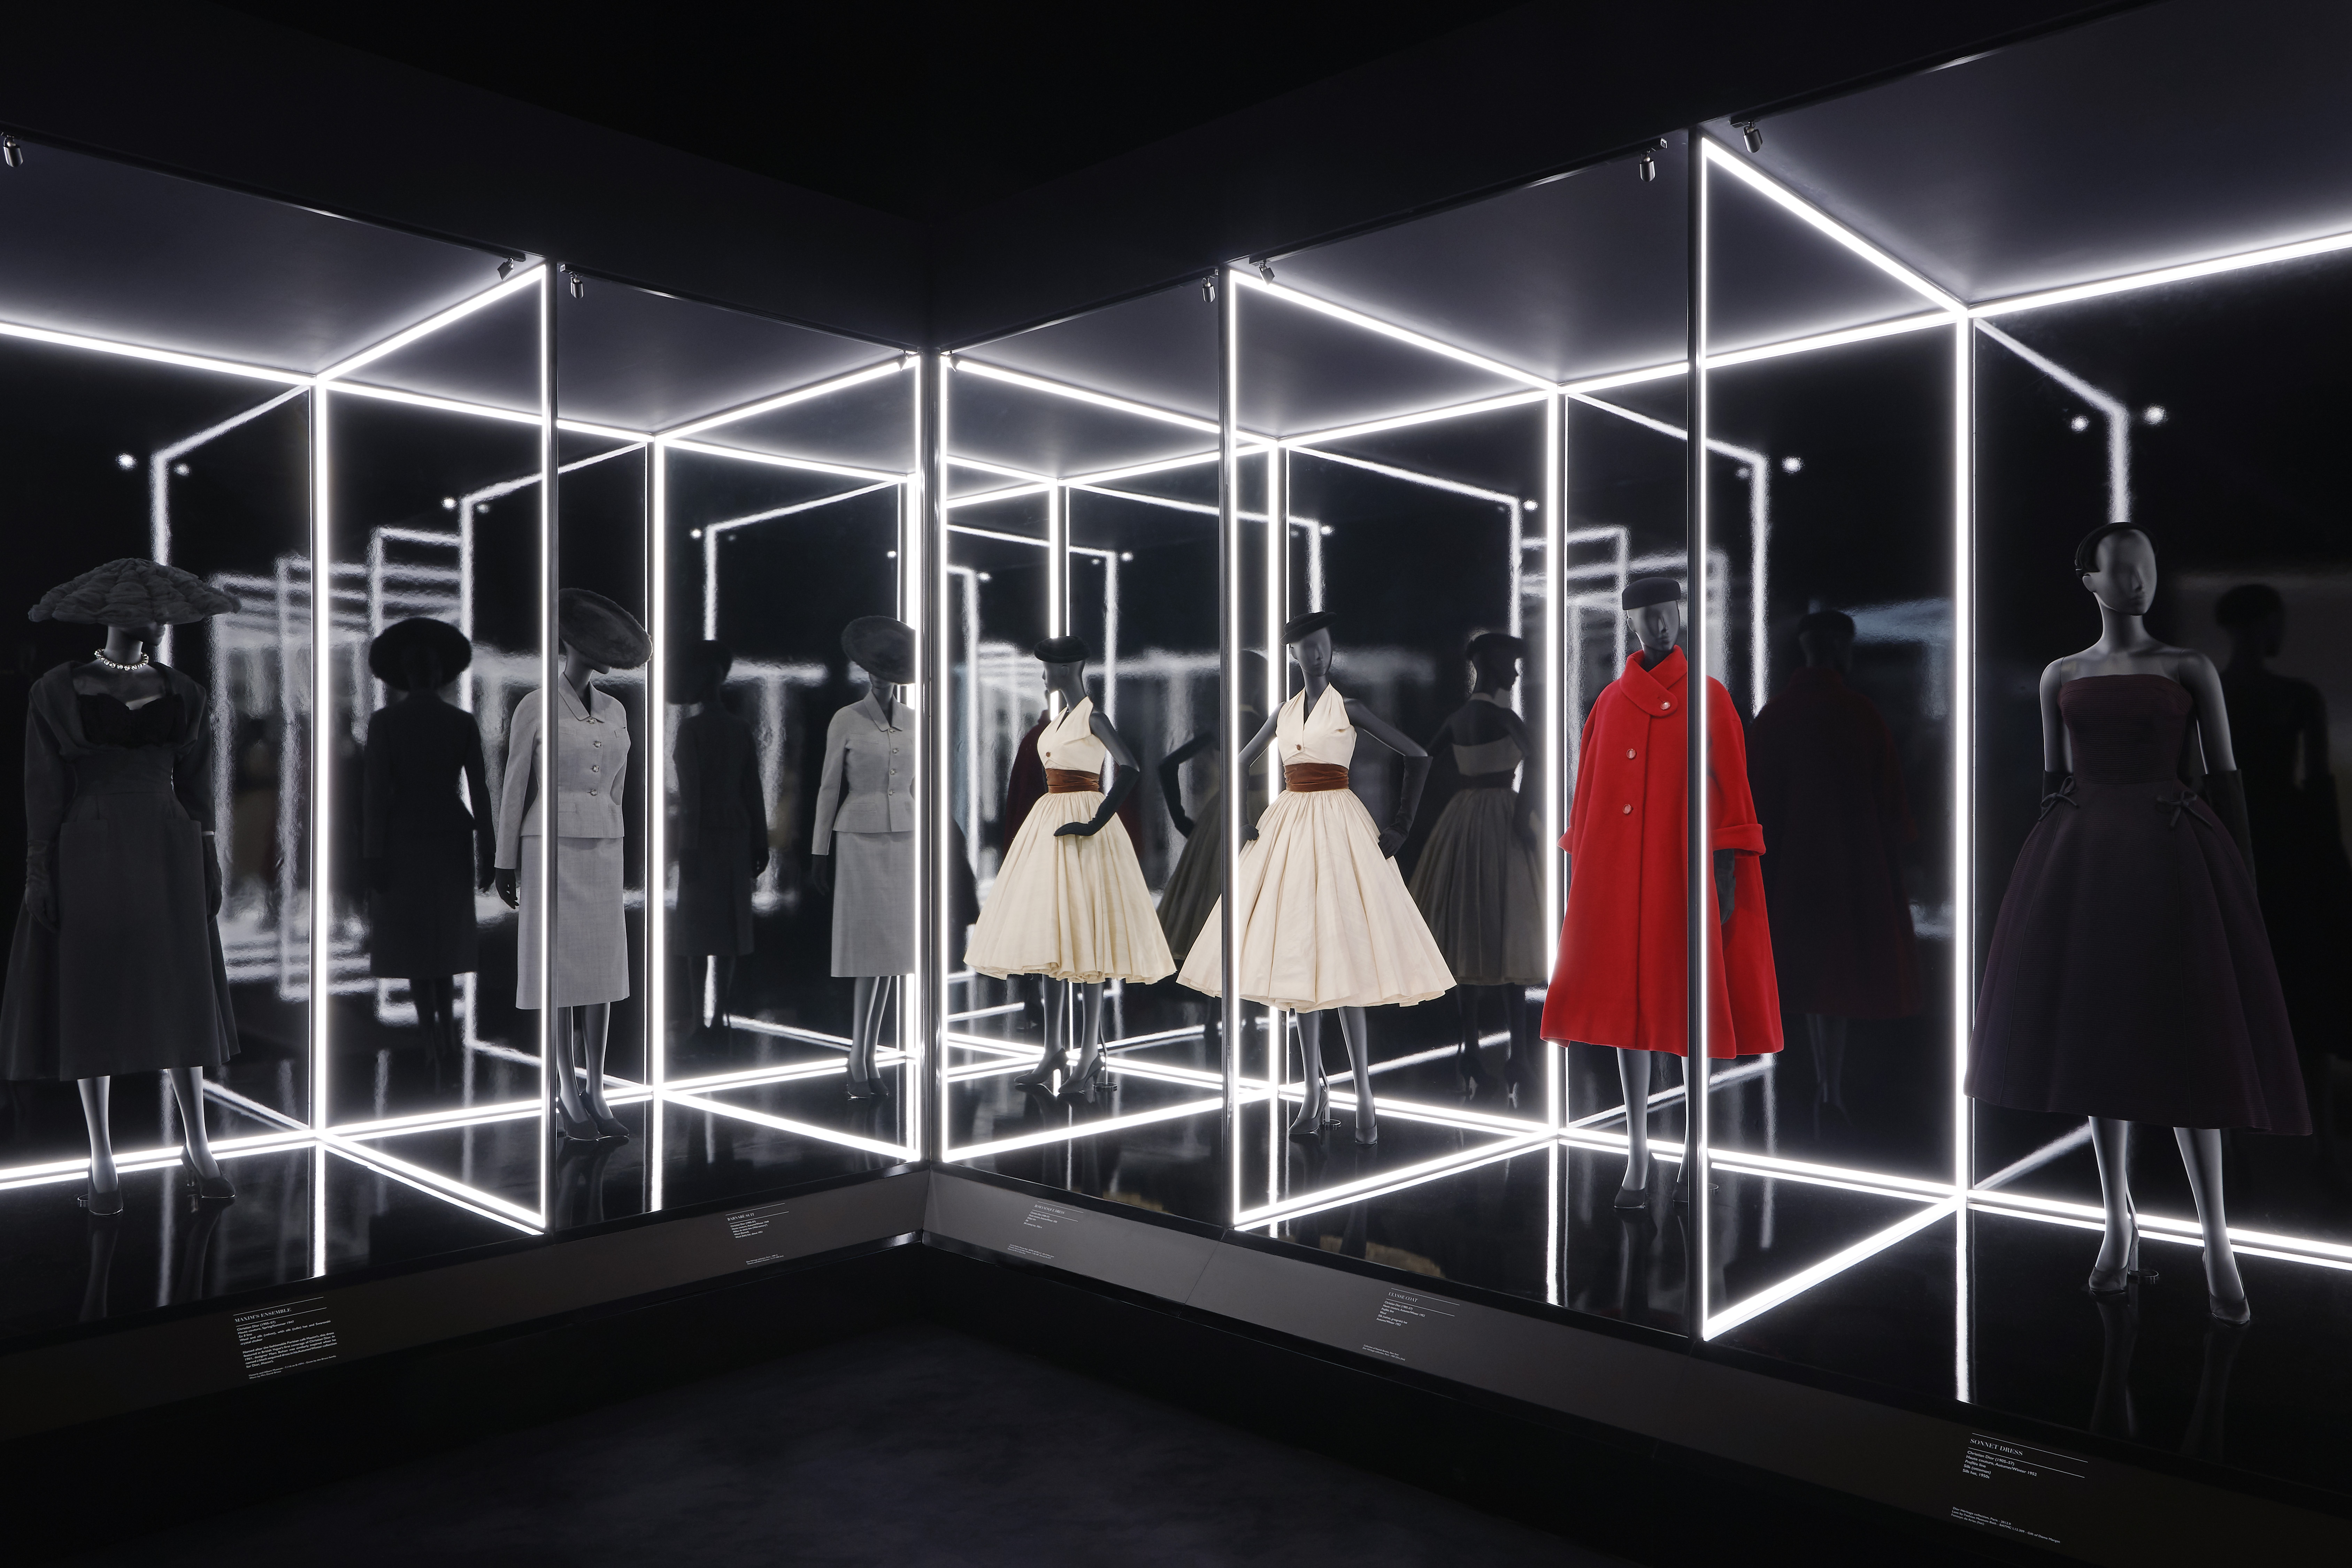 1548861945368-V_A_Christian-Dior-Designer-of-Dreams-exhibition_The-Dior-Line-section-c-ADRIEN-DIRAND-7